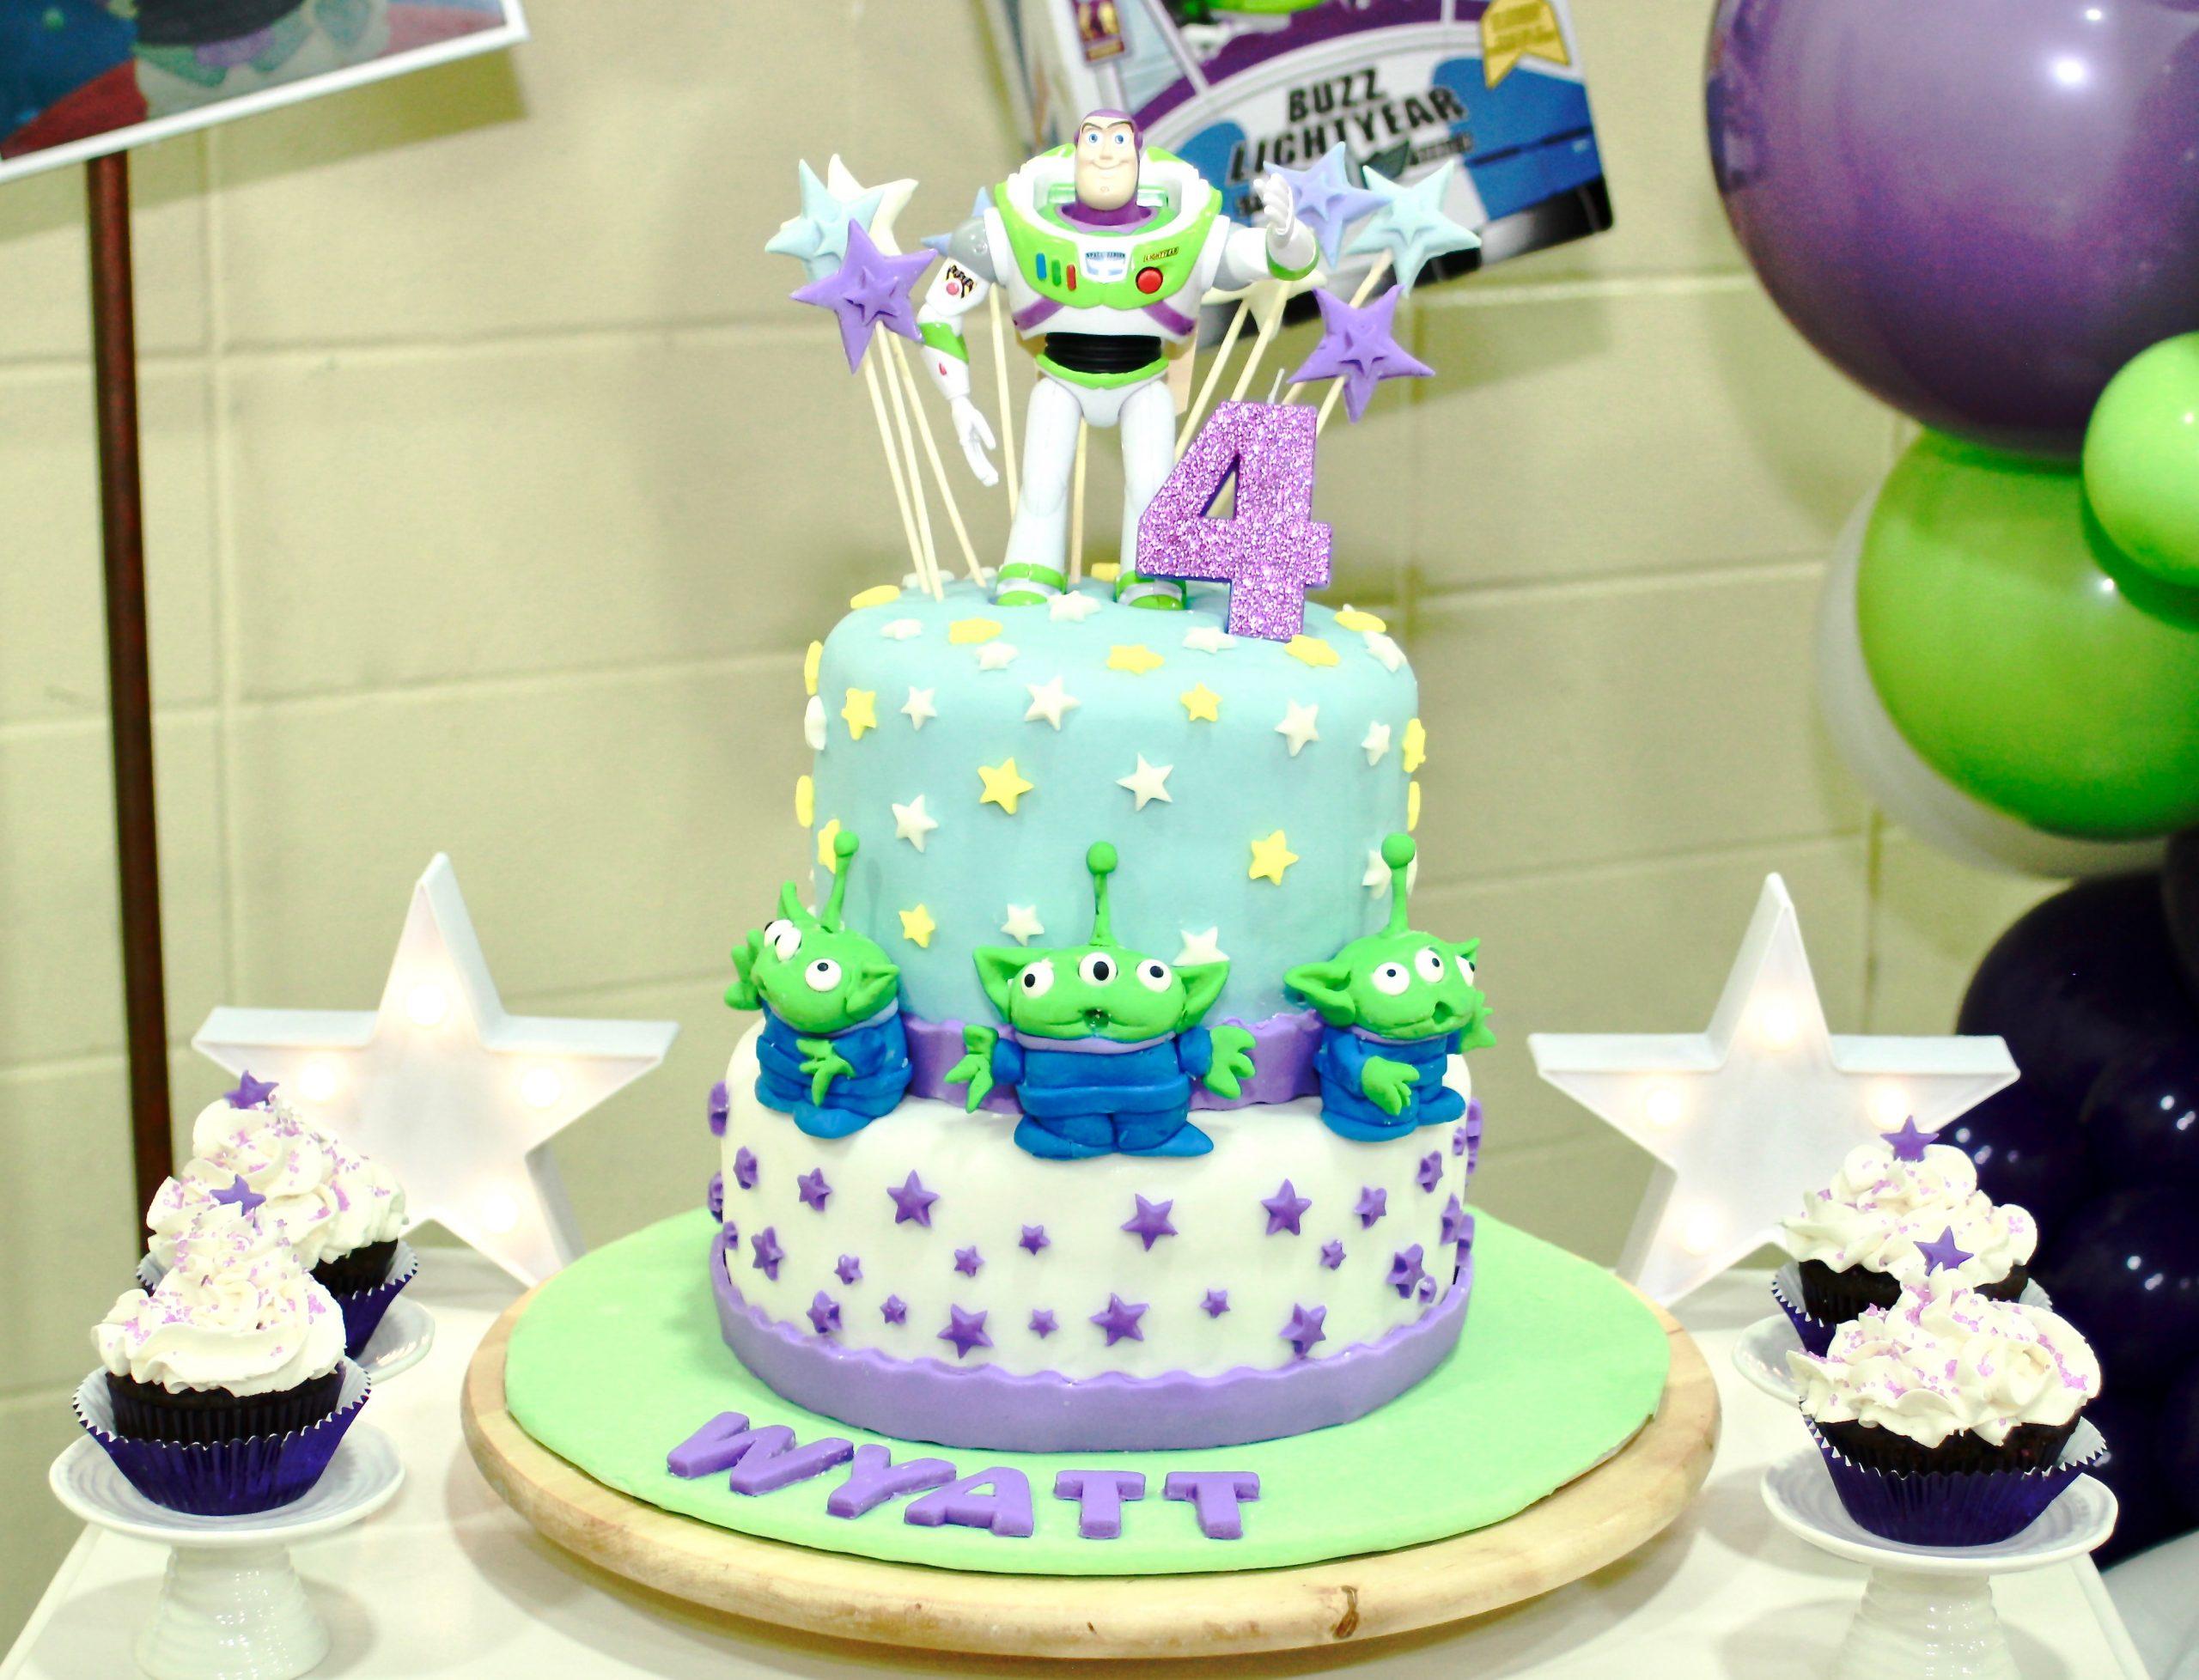 Buzz Lightyear Birthday Party-10